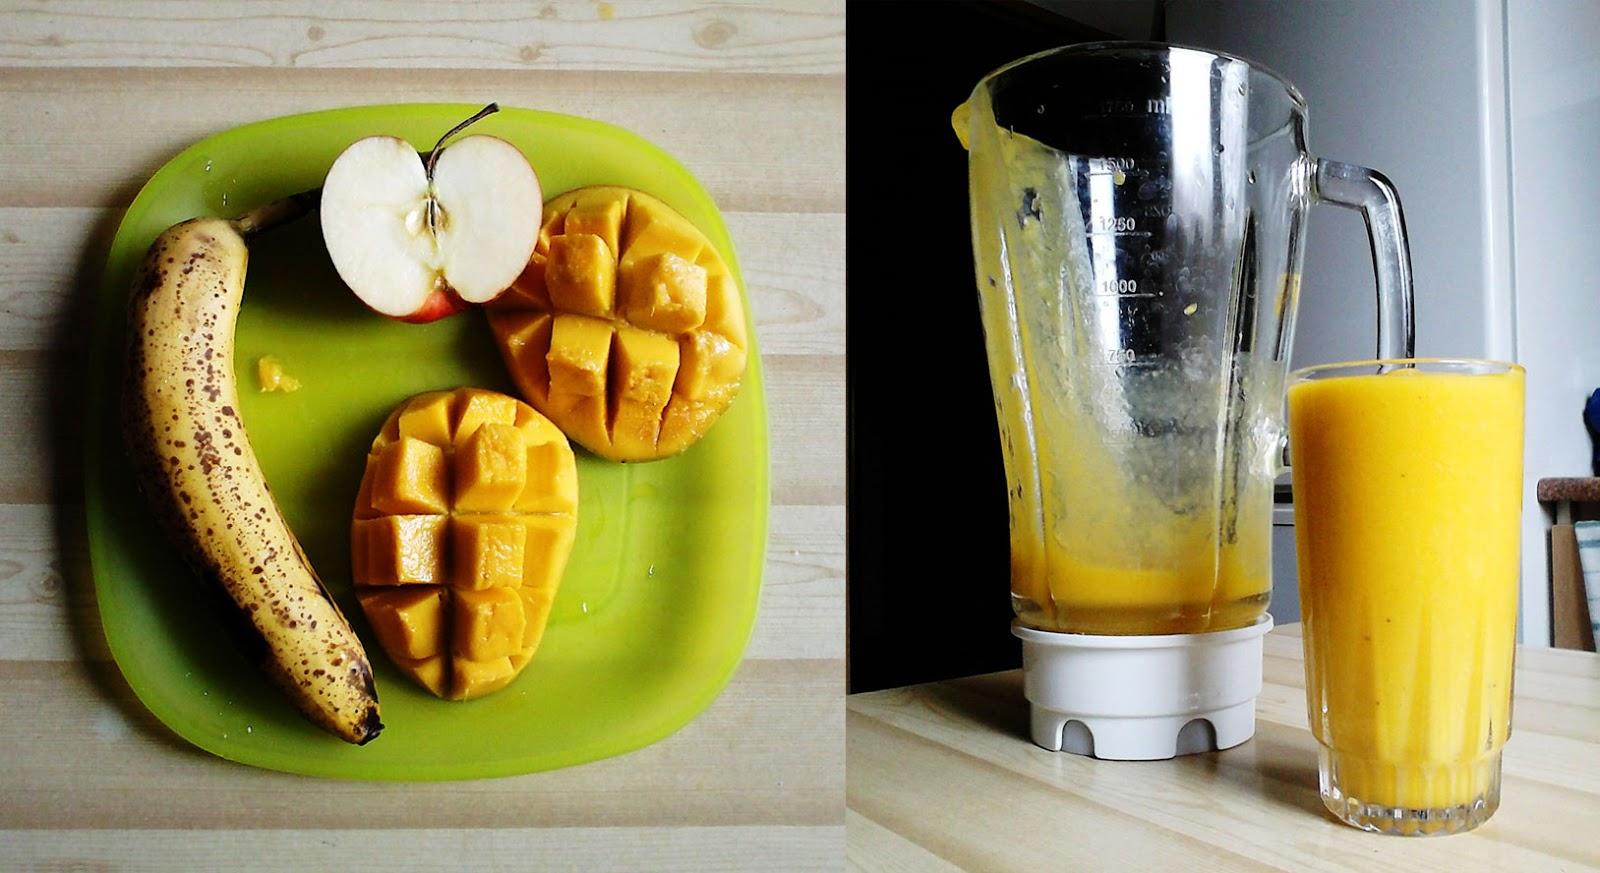 Owoce lub owocowy szejk